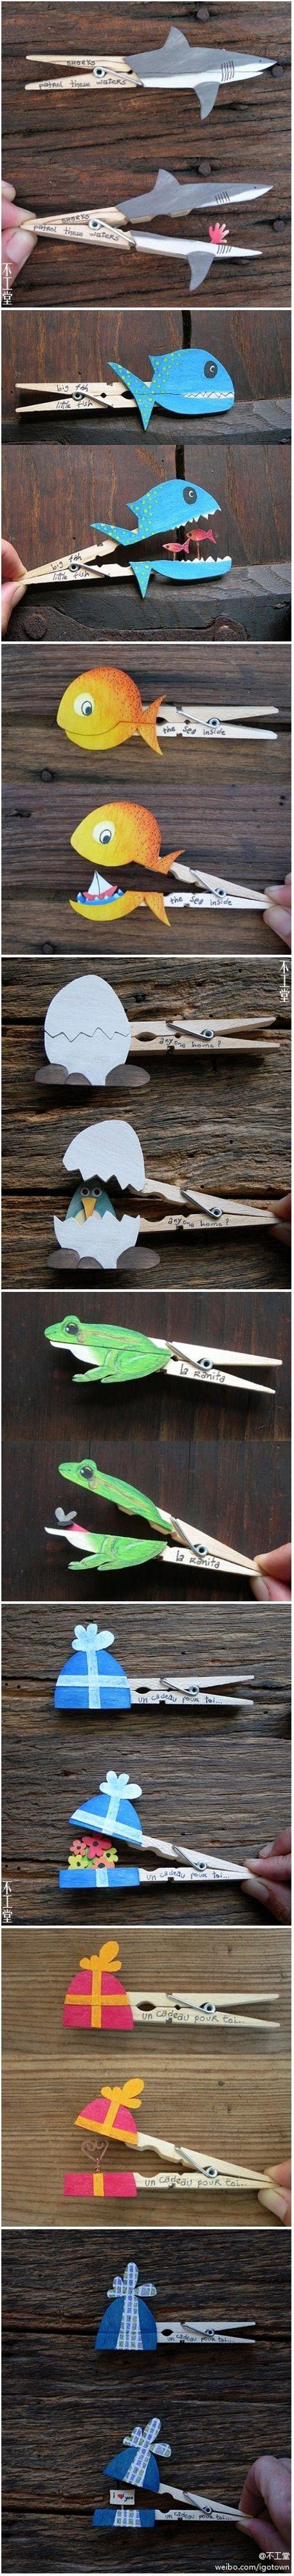 funny craft